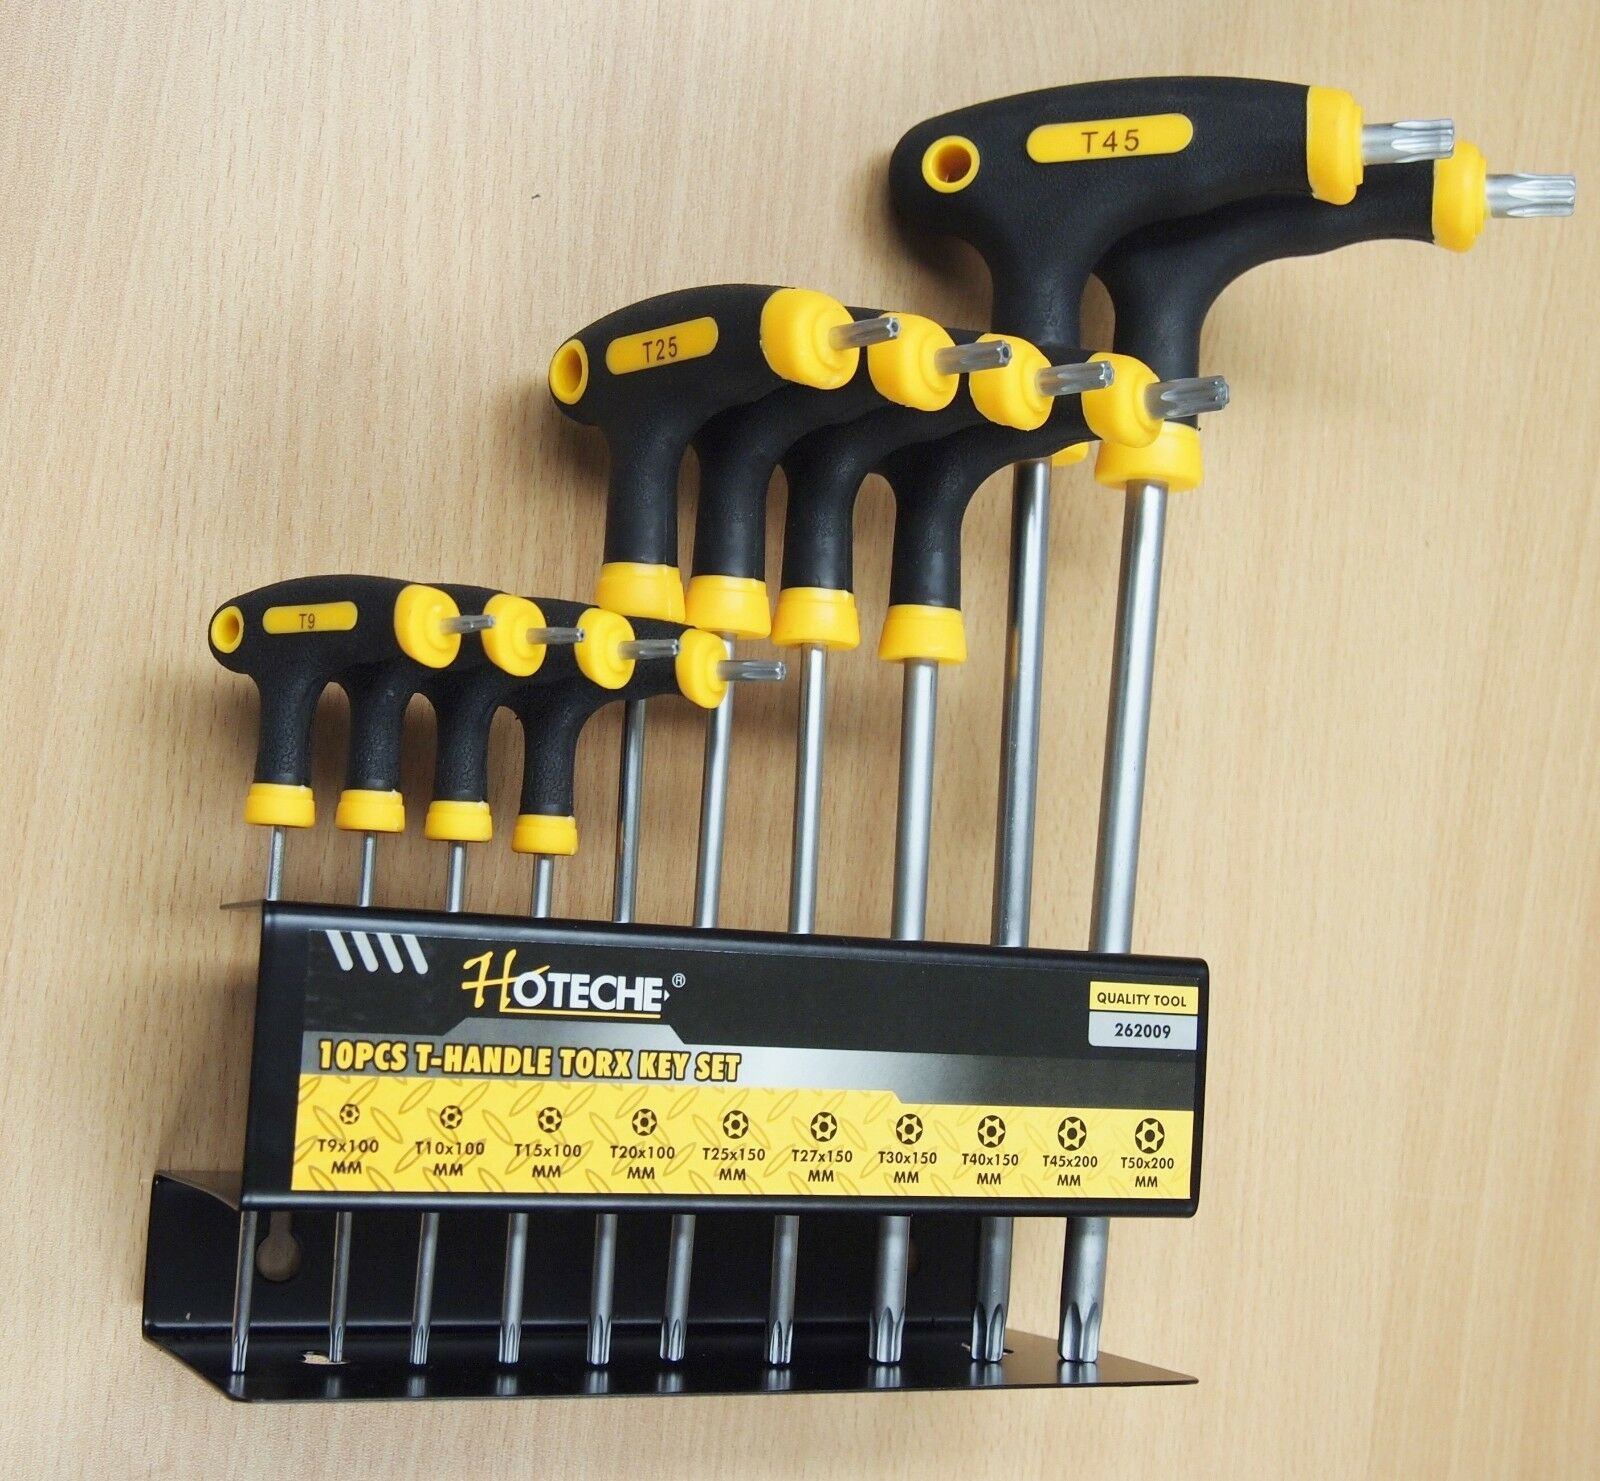 Bondhus Gorilla Grip Tamper Resistant Security Torx Star Fold Up Wrench T7-T25